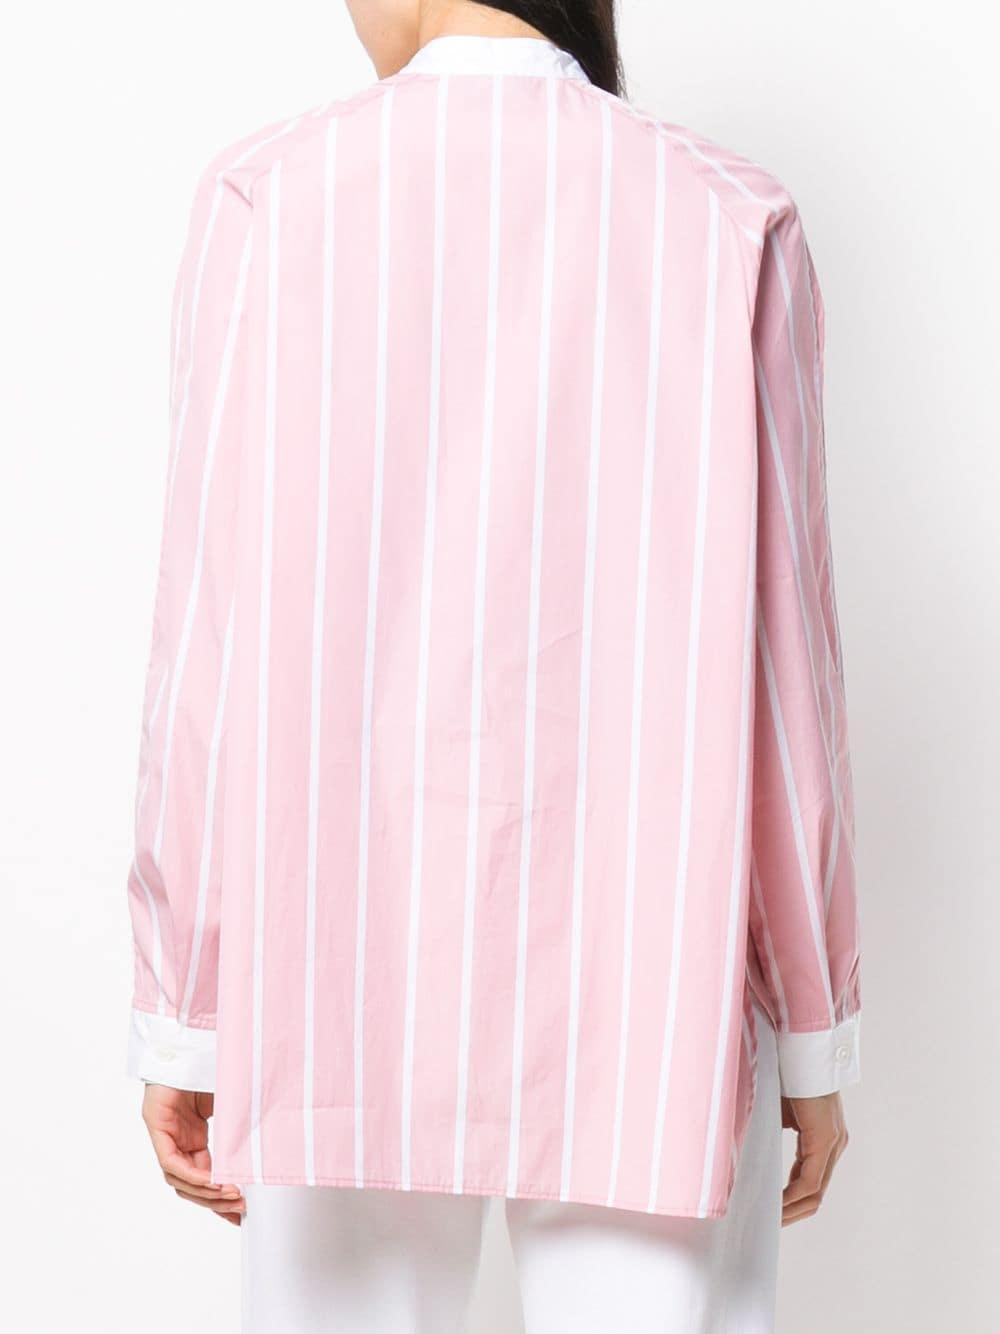 Camisa a rayas de manga larga Thierry Colson de Algodón de color Rosa